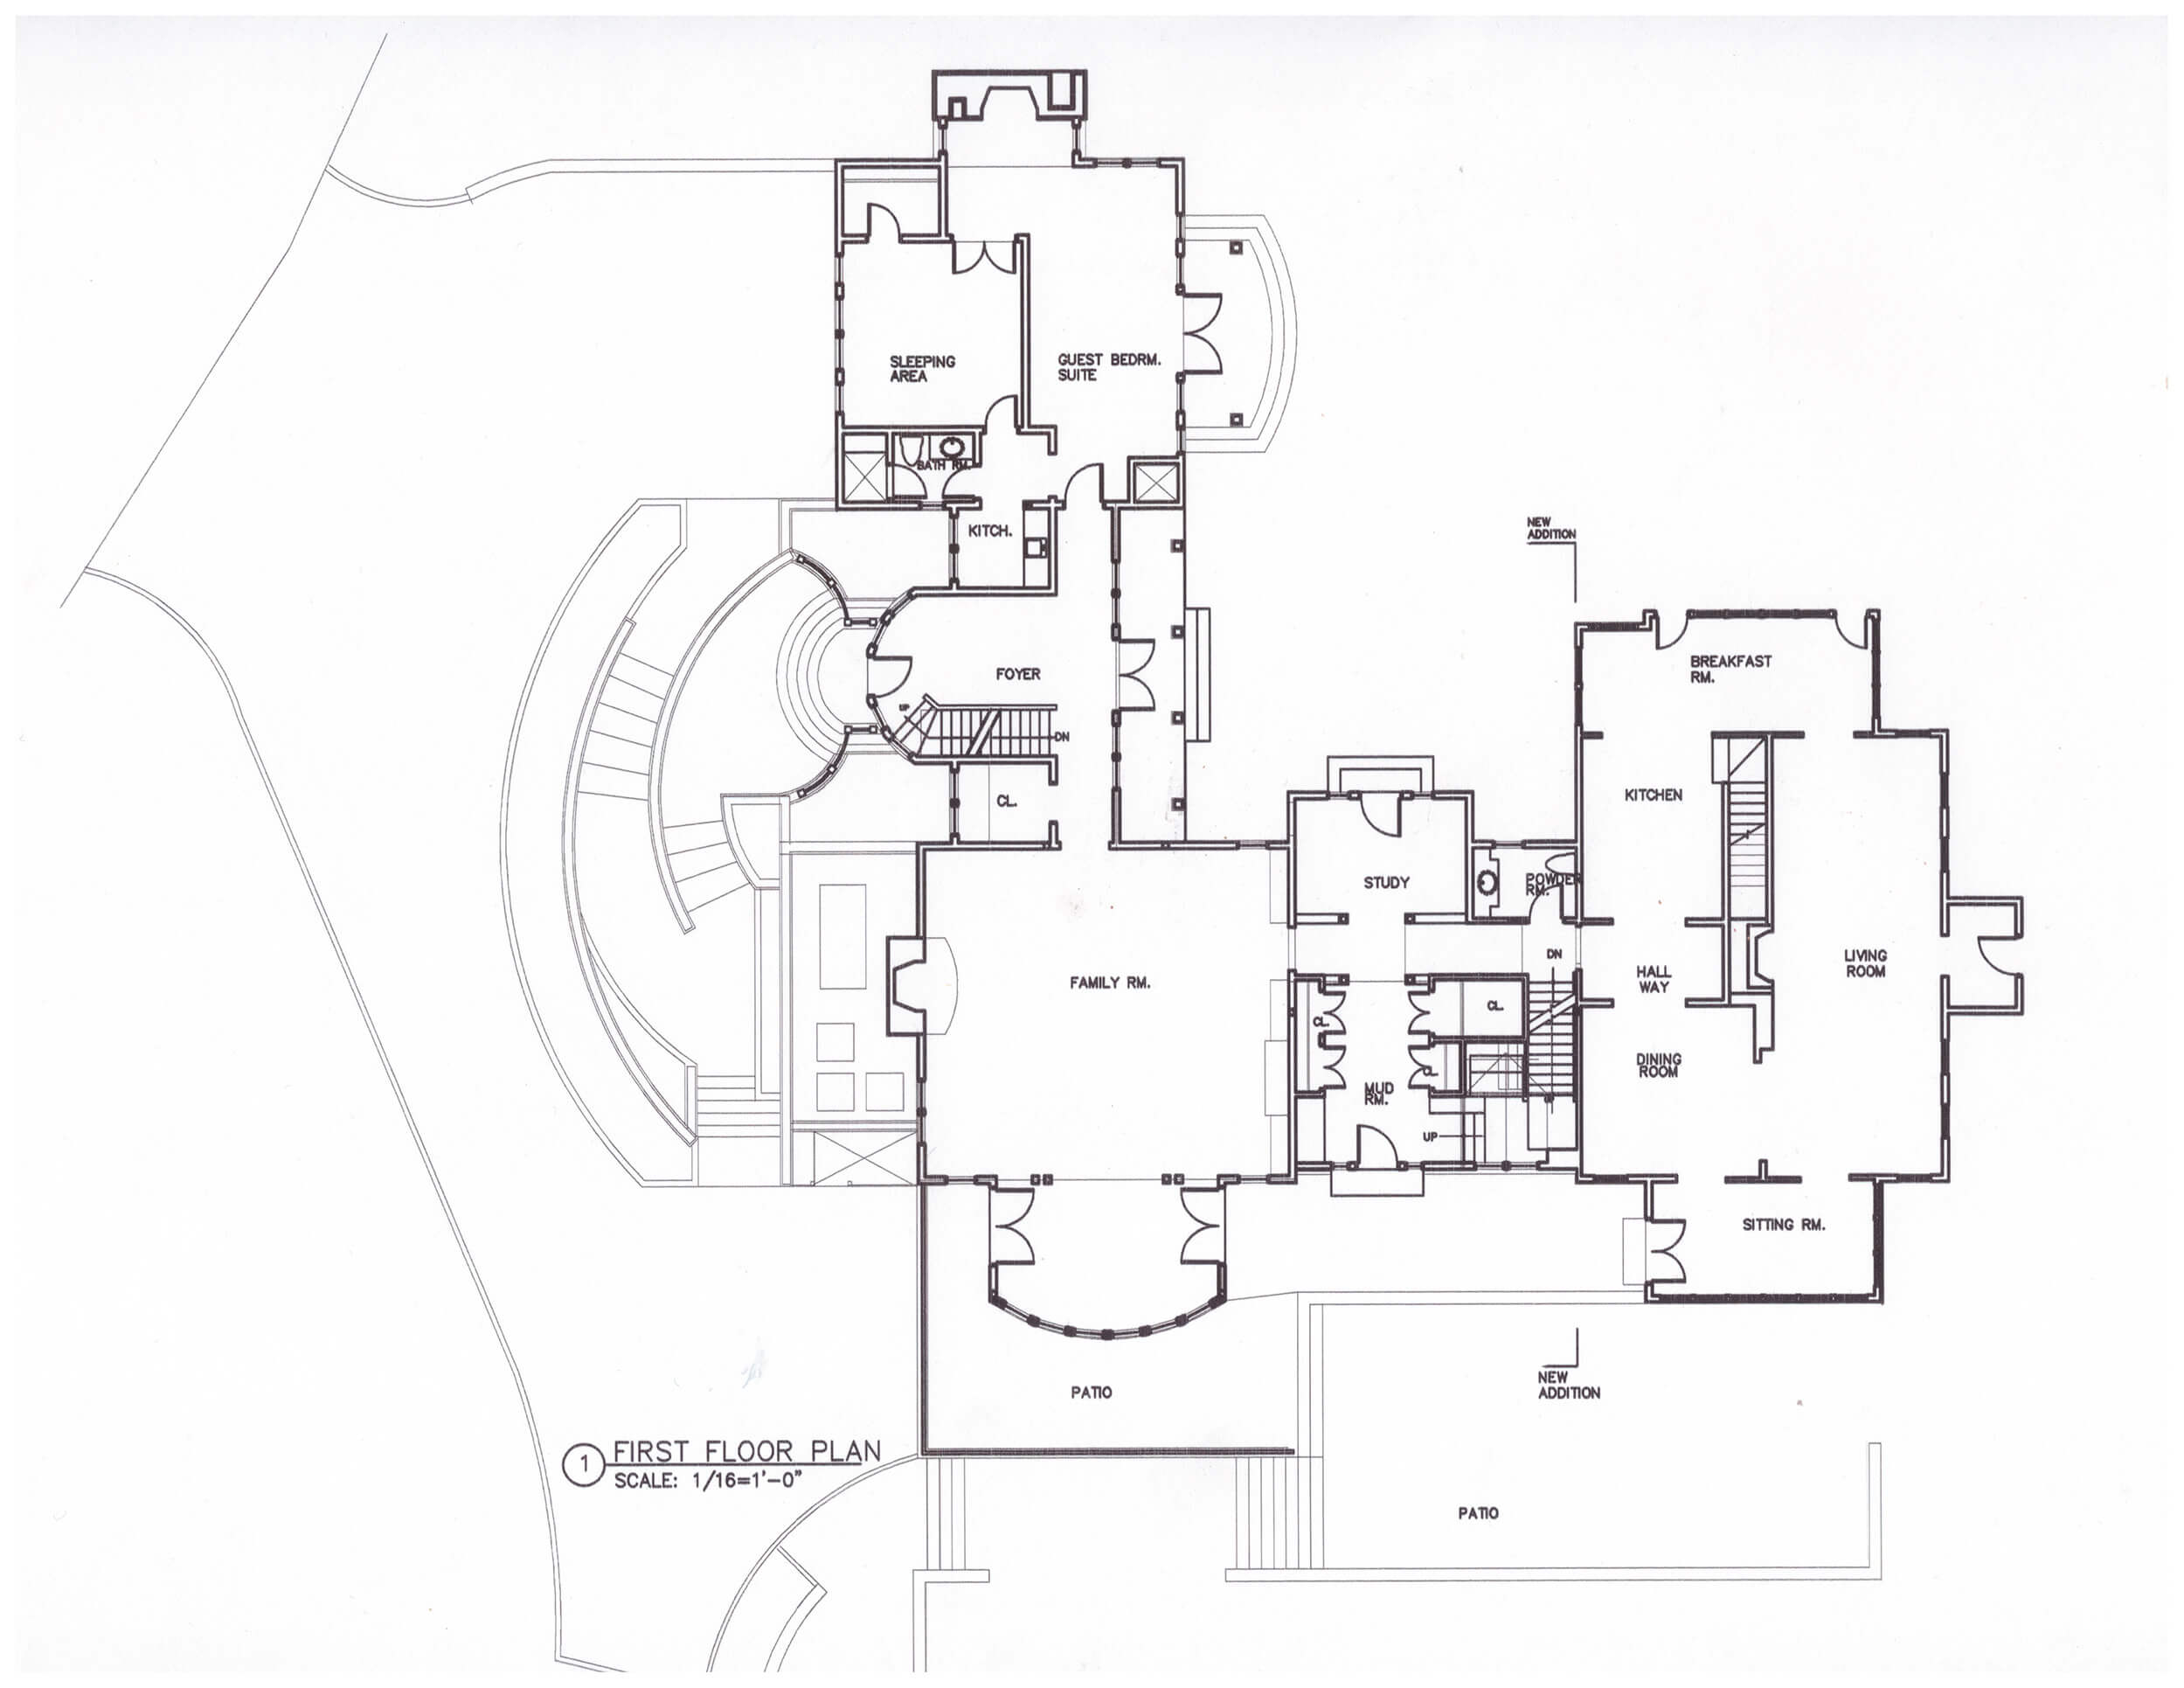 AHH_first_floor_plan.jpg